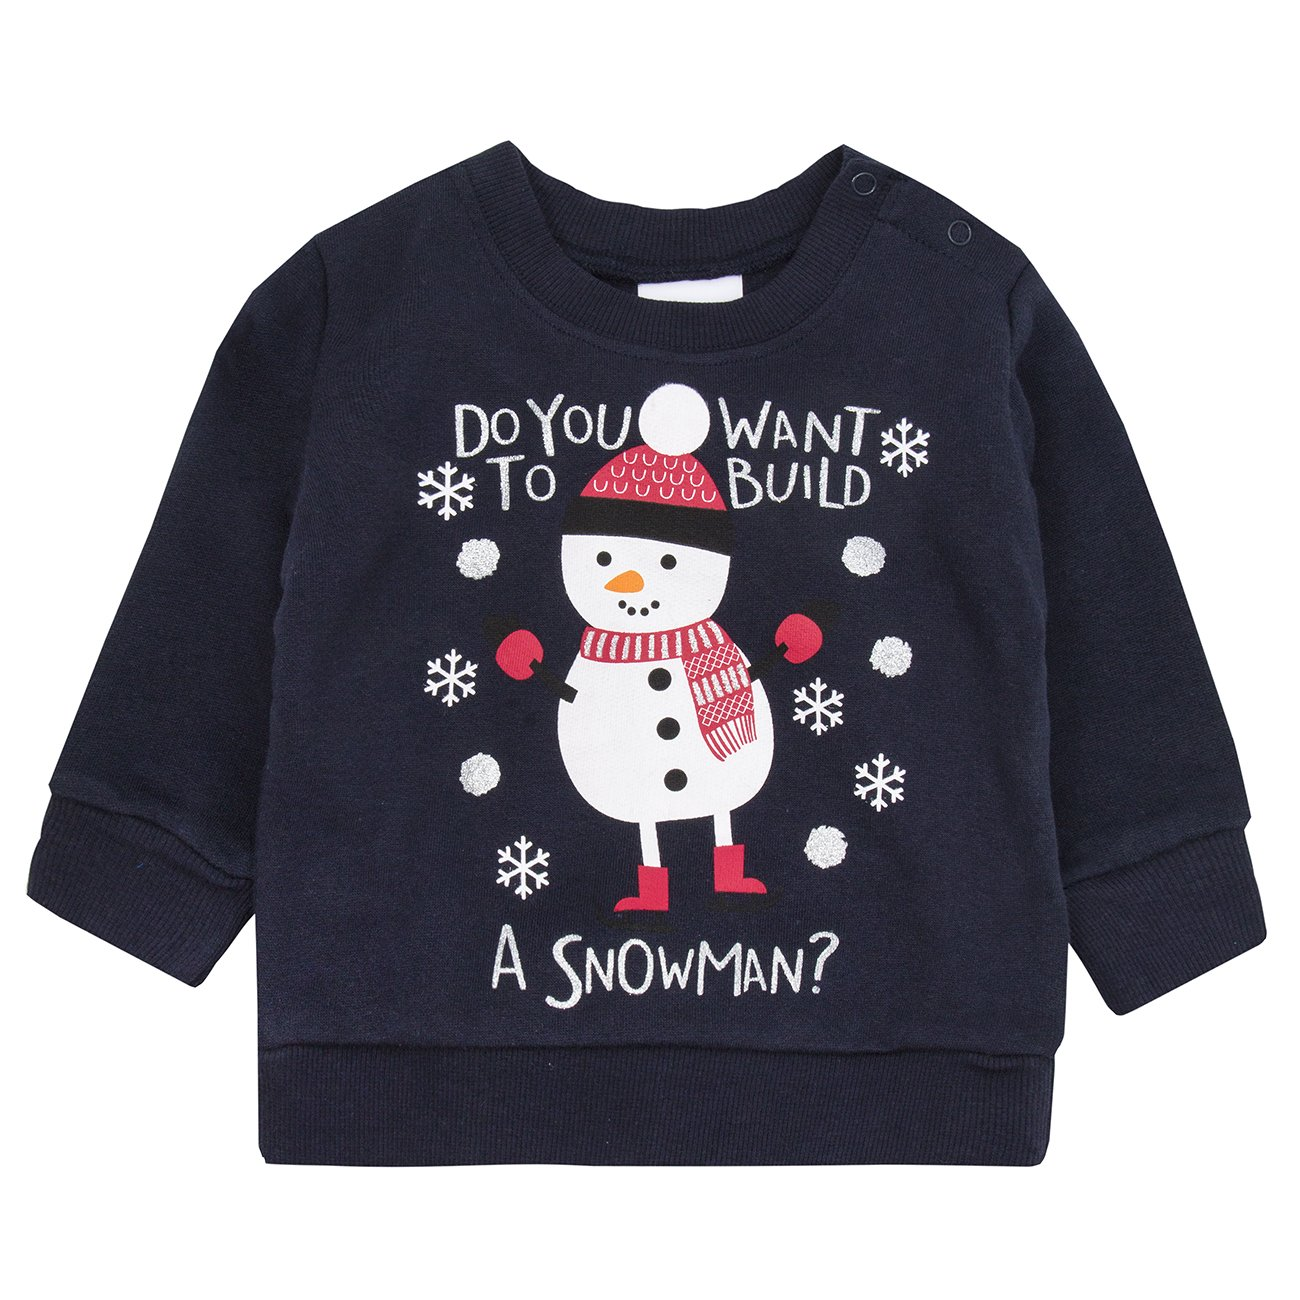 4Kidz 4Kidz Kidz pour enfants de Noël fantaisie Pull Sweat-shirt